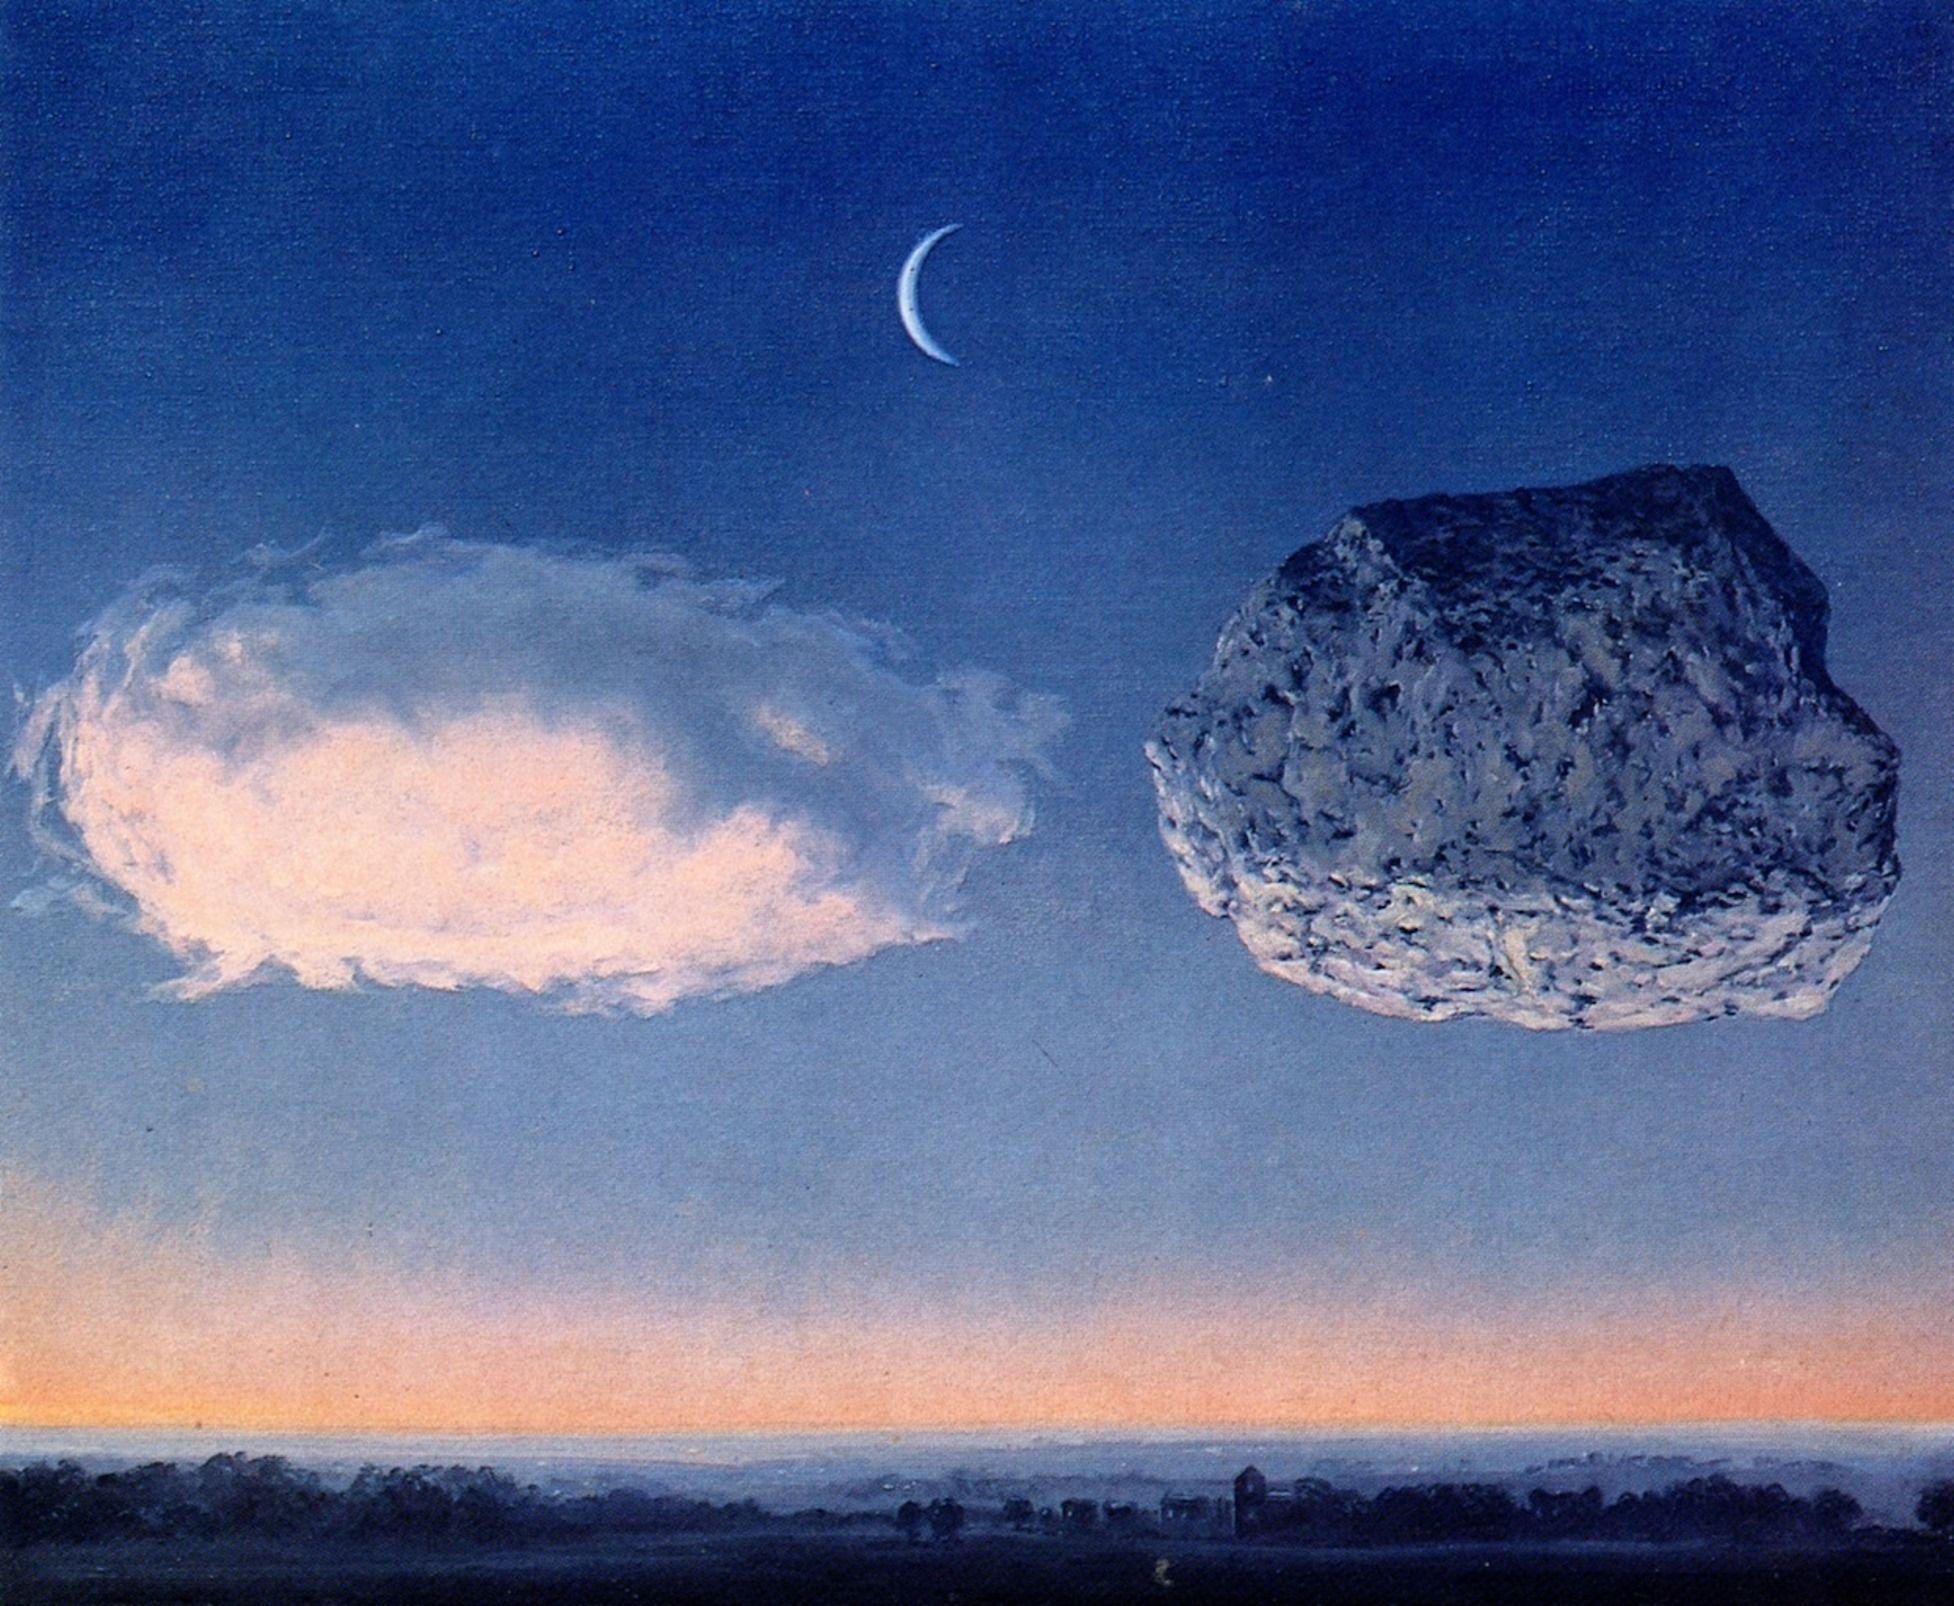 Rene Magritte Bel ルネ マグリット 白 マグリット シュルレアリスム モダンアート